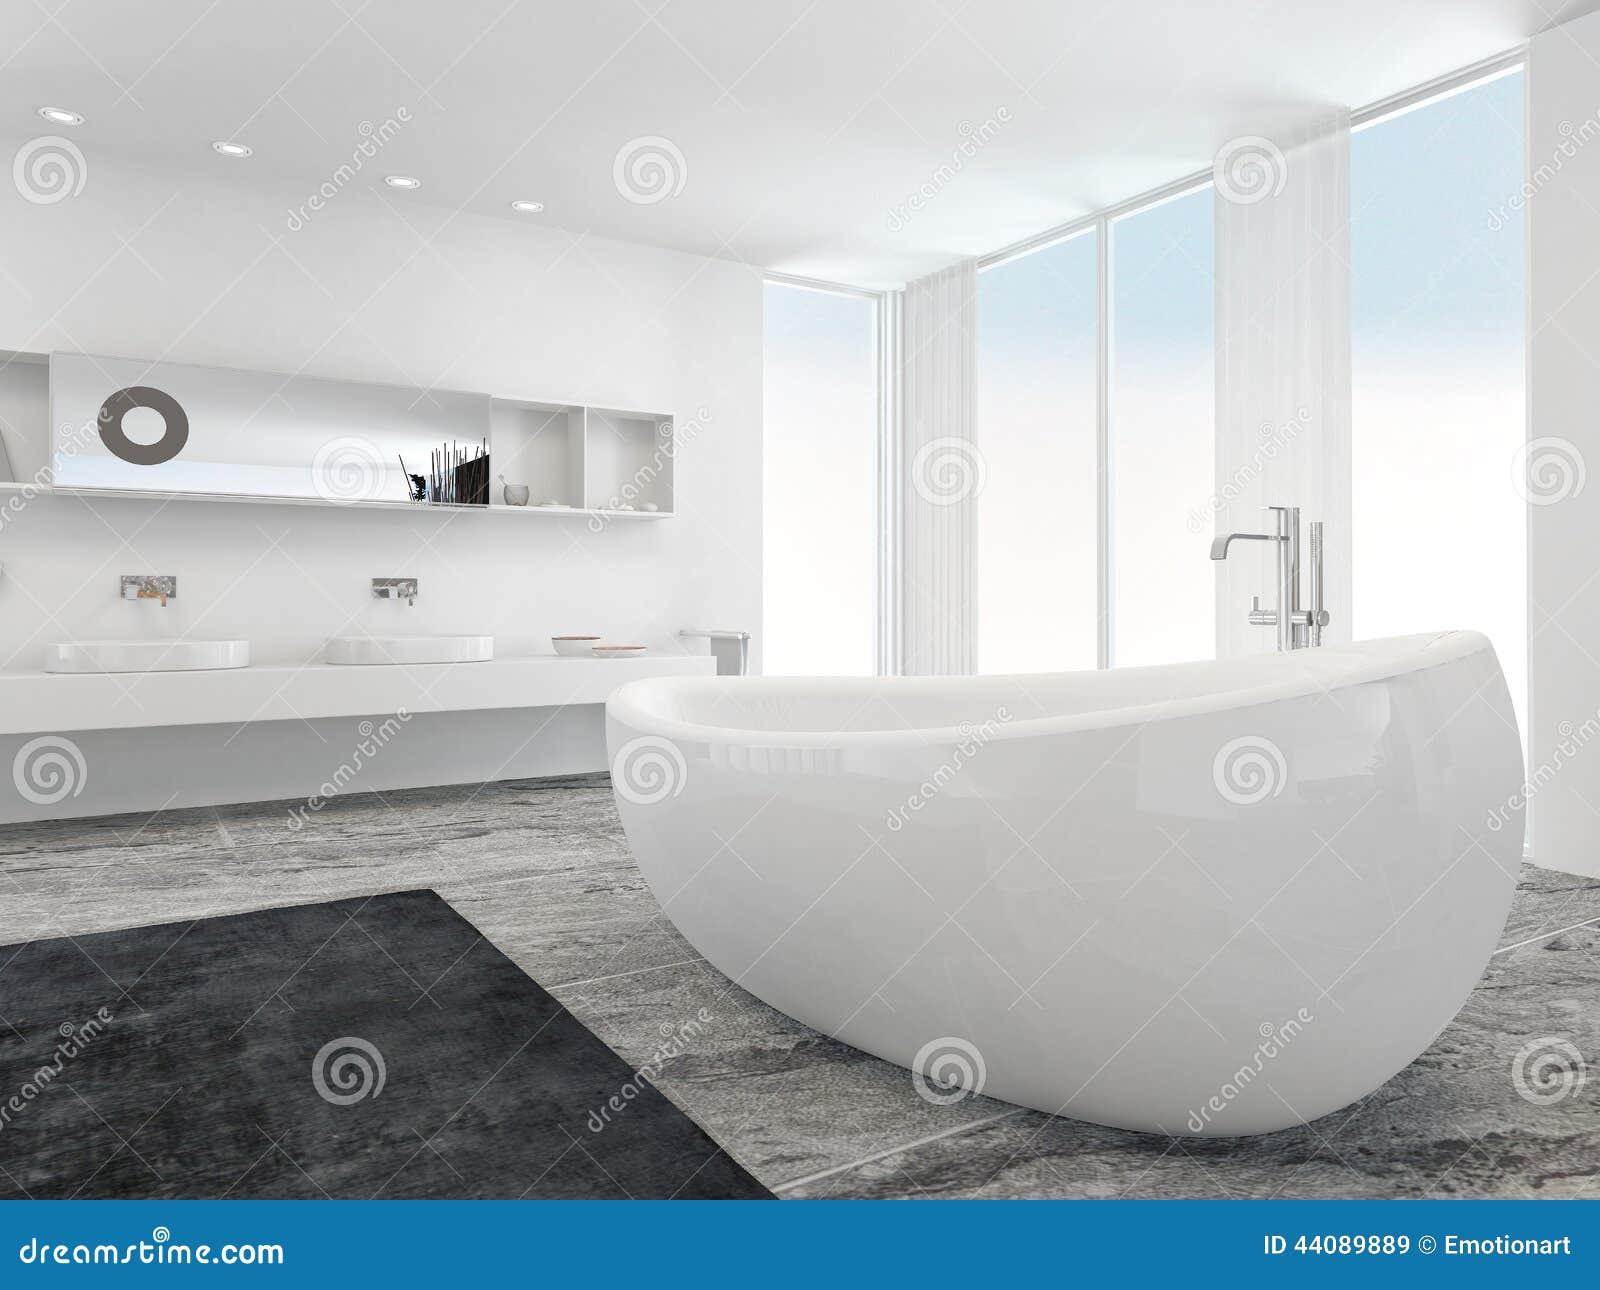 Mycket rymligt ljust modernt badrum med badkaret stock for Salle de bain avec baignoire a pied